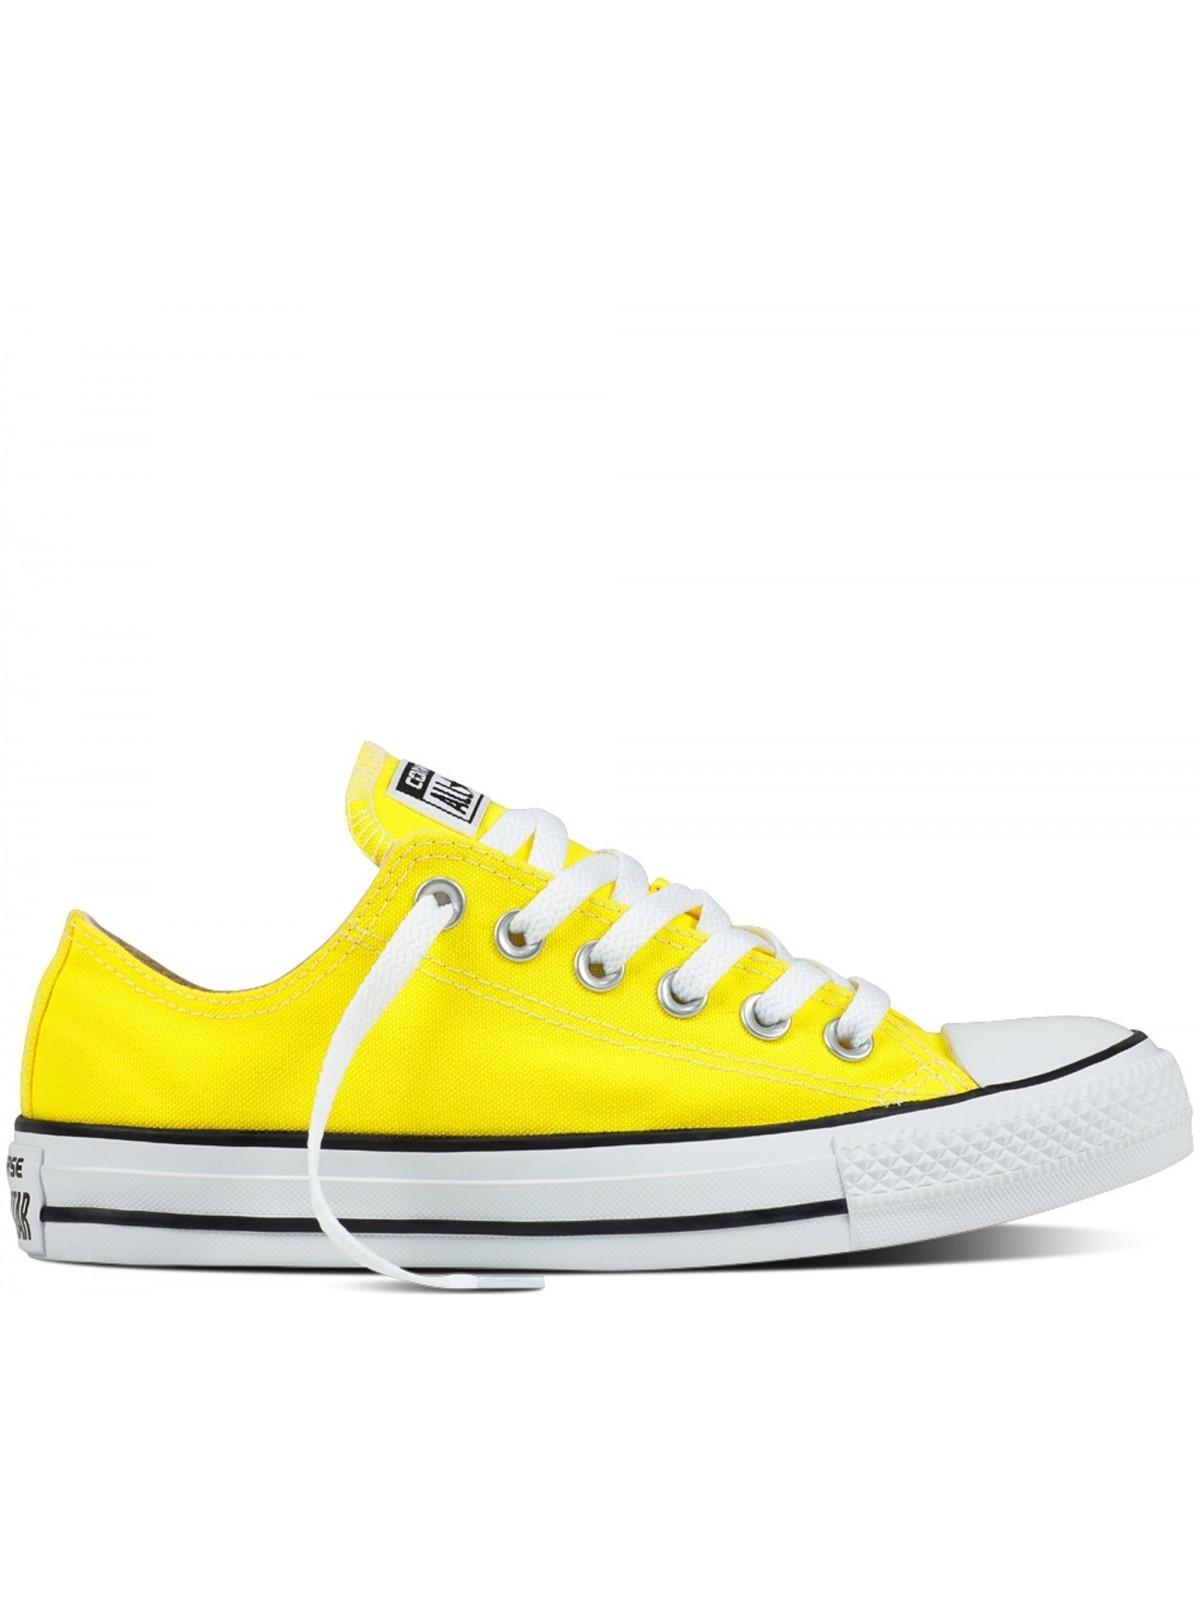 converse basse jaune moutarde